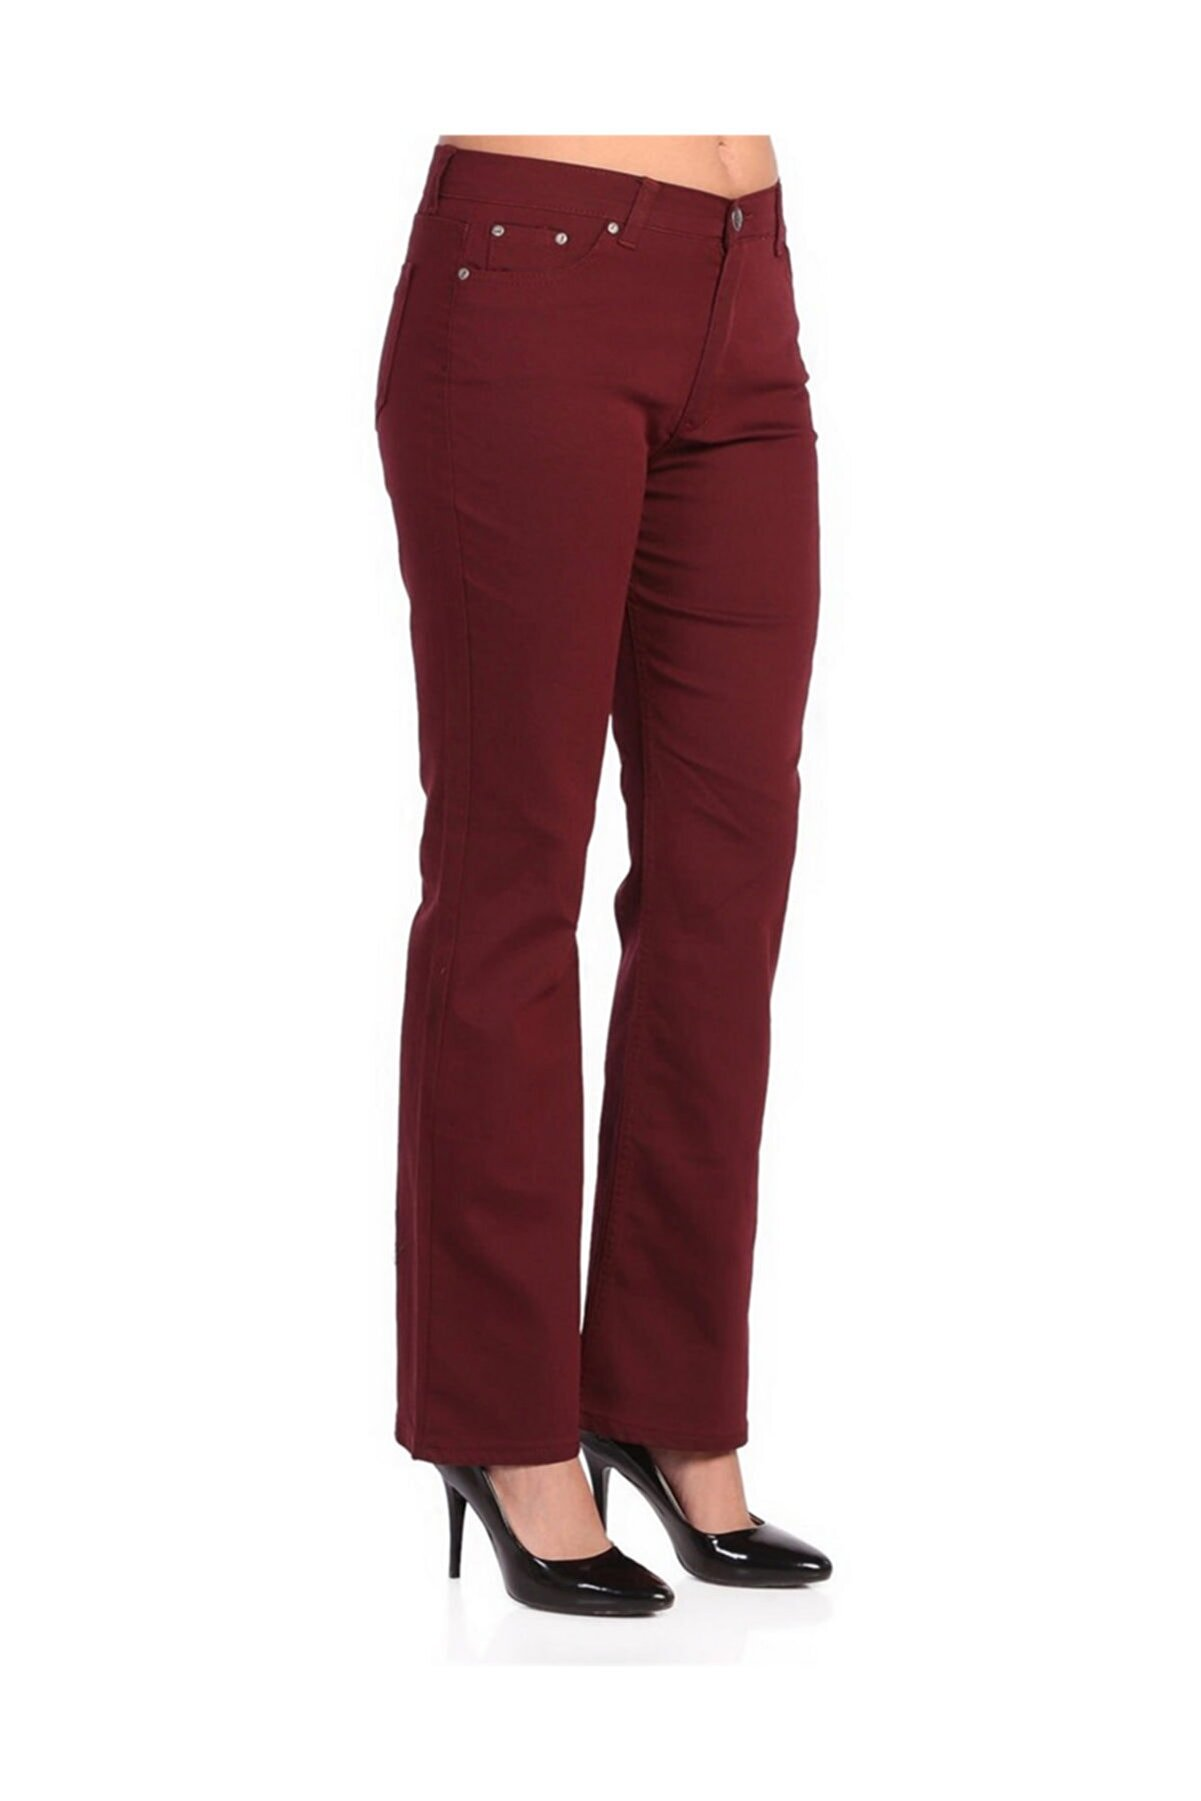 Rmg Kadın Bordo Kumaş Yüksek Bel İspanyol Paça Pantolon Rg1221pv